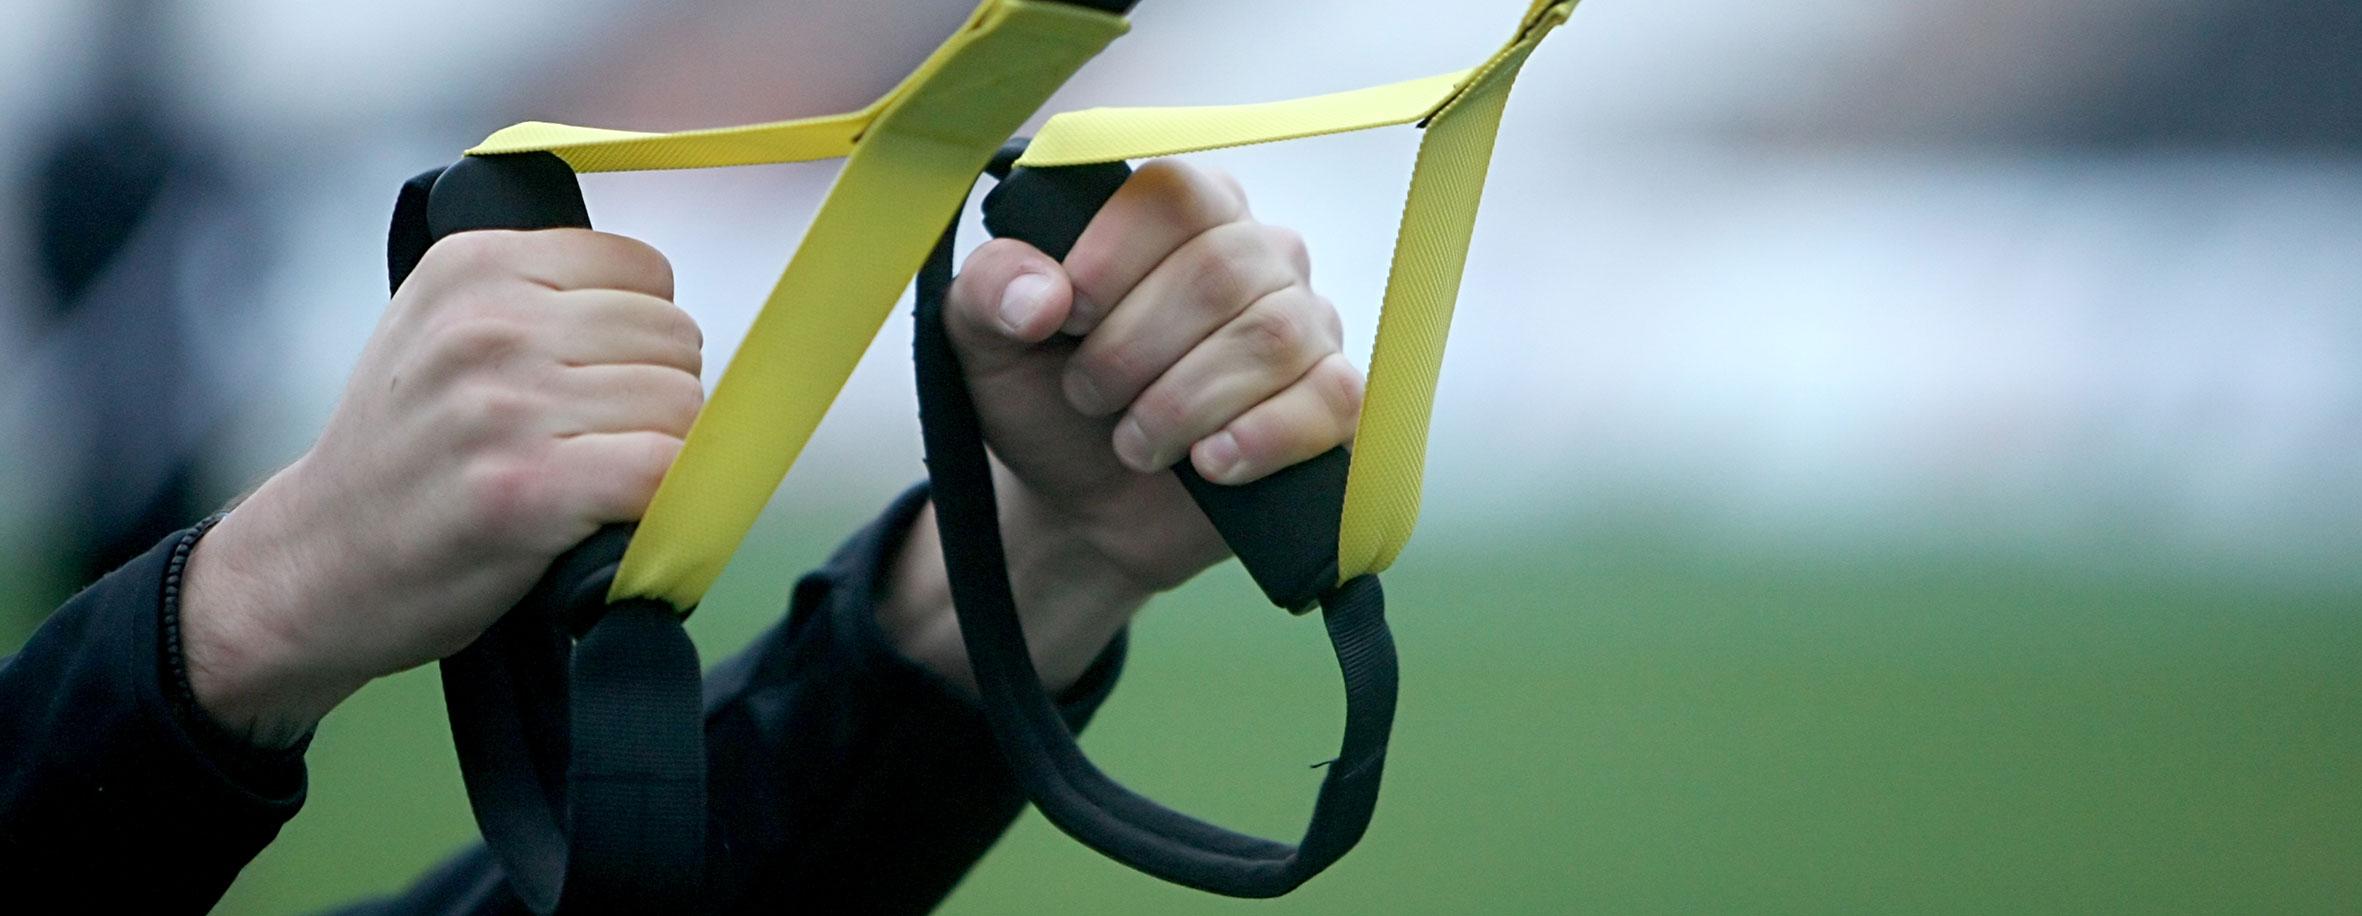 safe-outdoor-gym-equipment.jpg